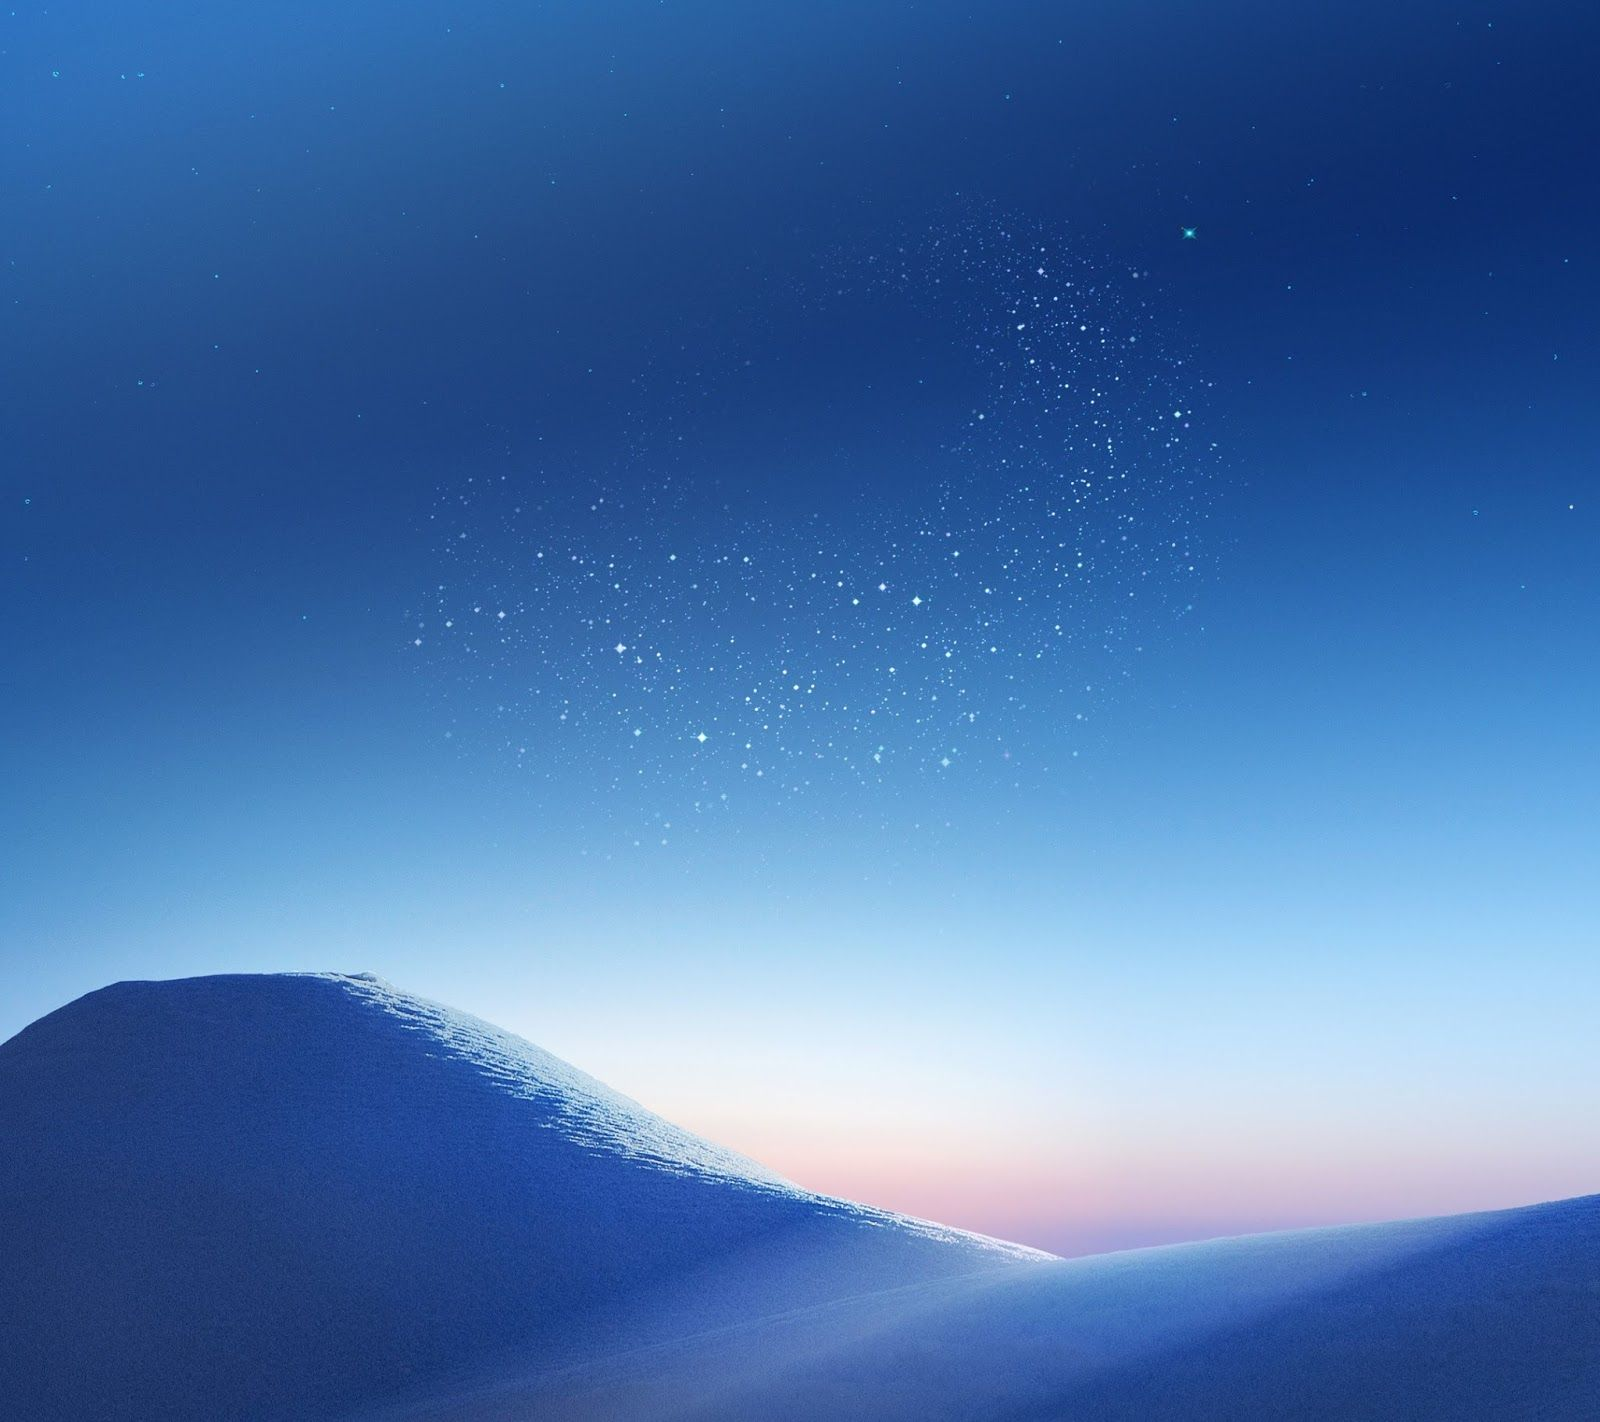 Samsung 4k Ultra Hd Galaxy Wallpapers Top Free Samsung 4k Ultra Hd Galaxy Backgrounds Wallpaperaccess